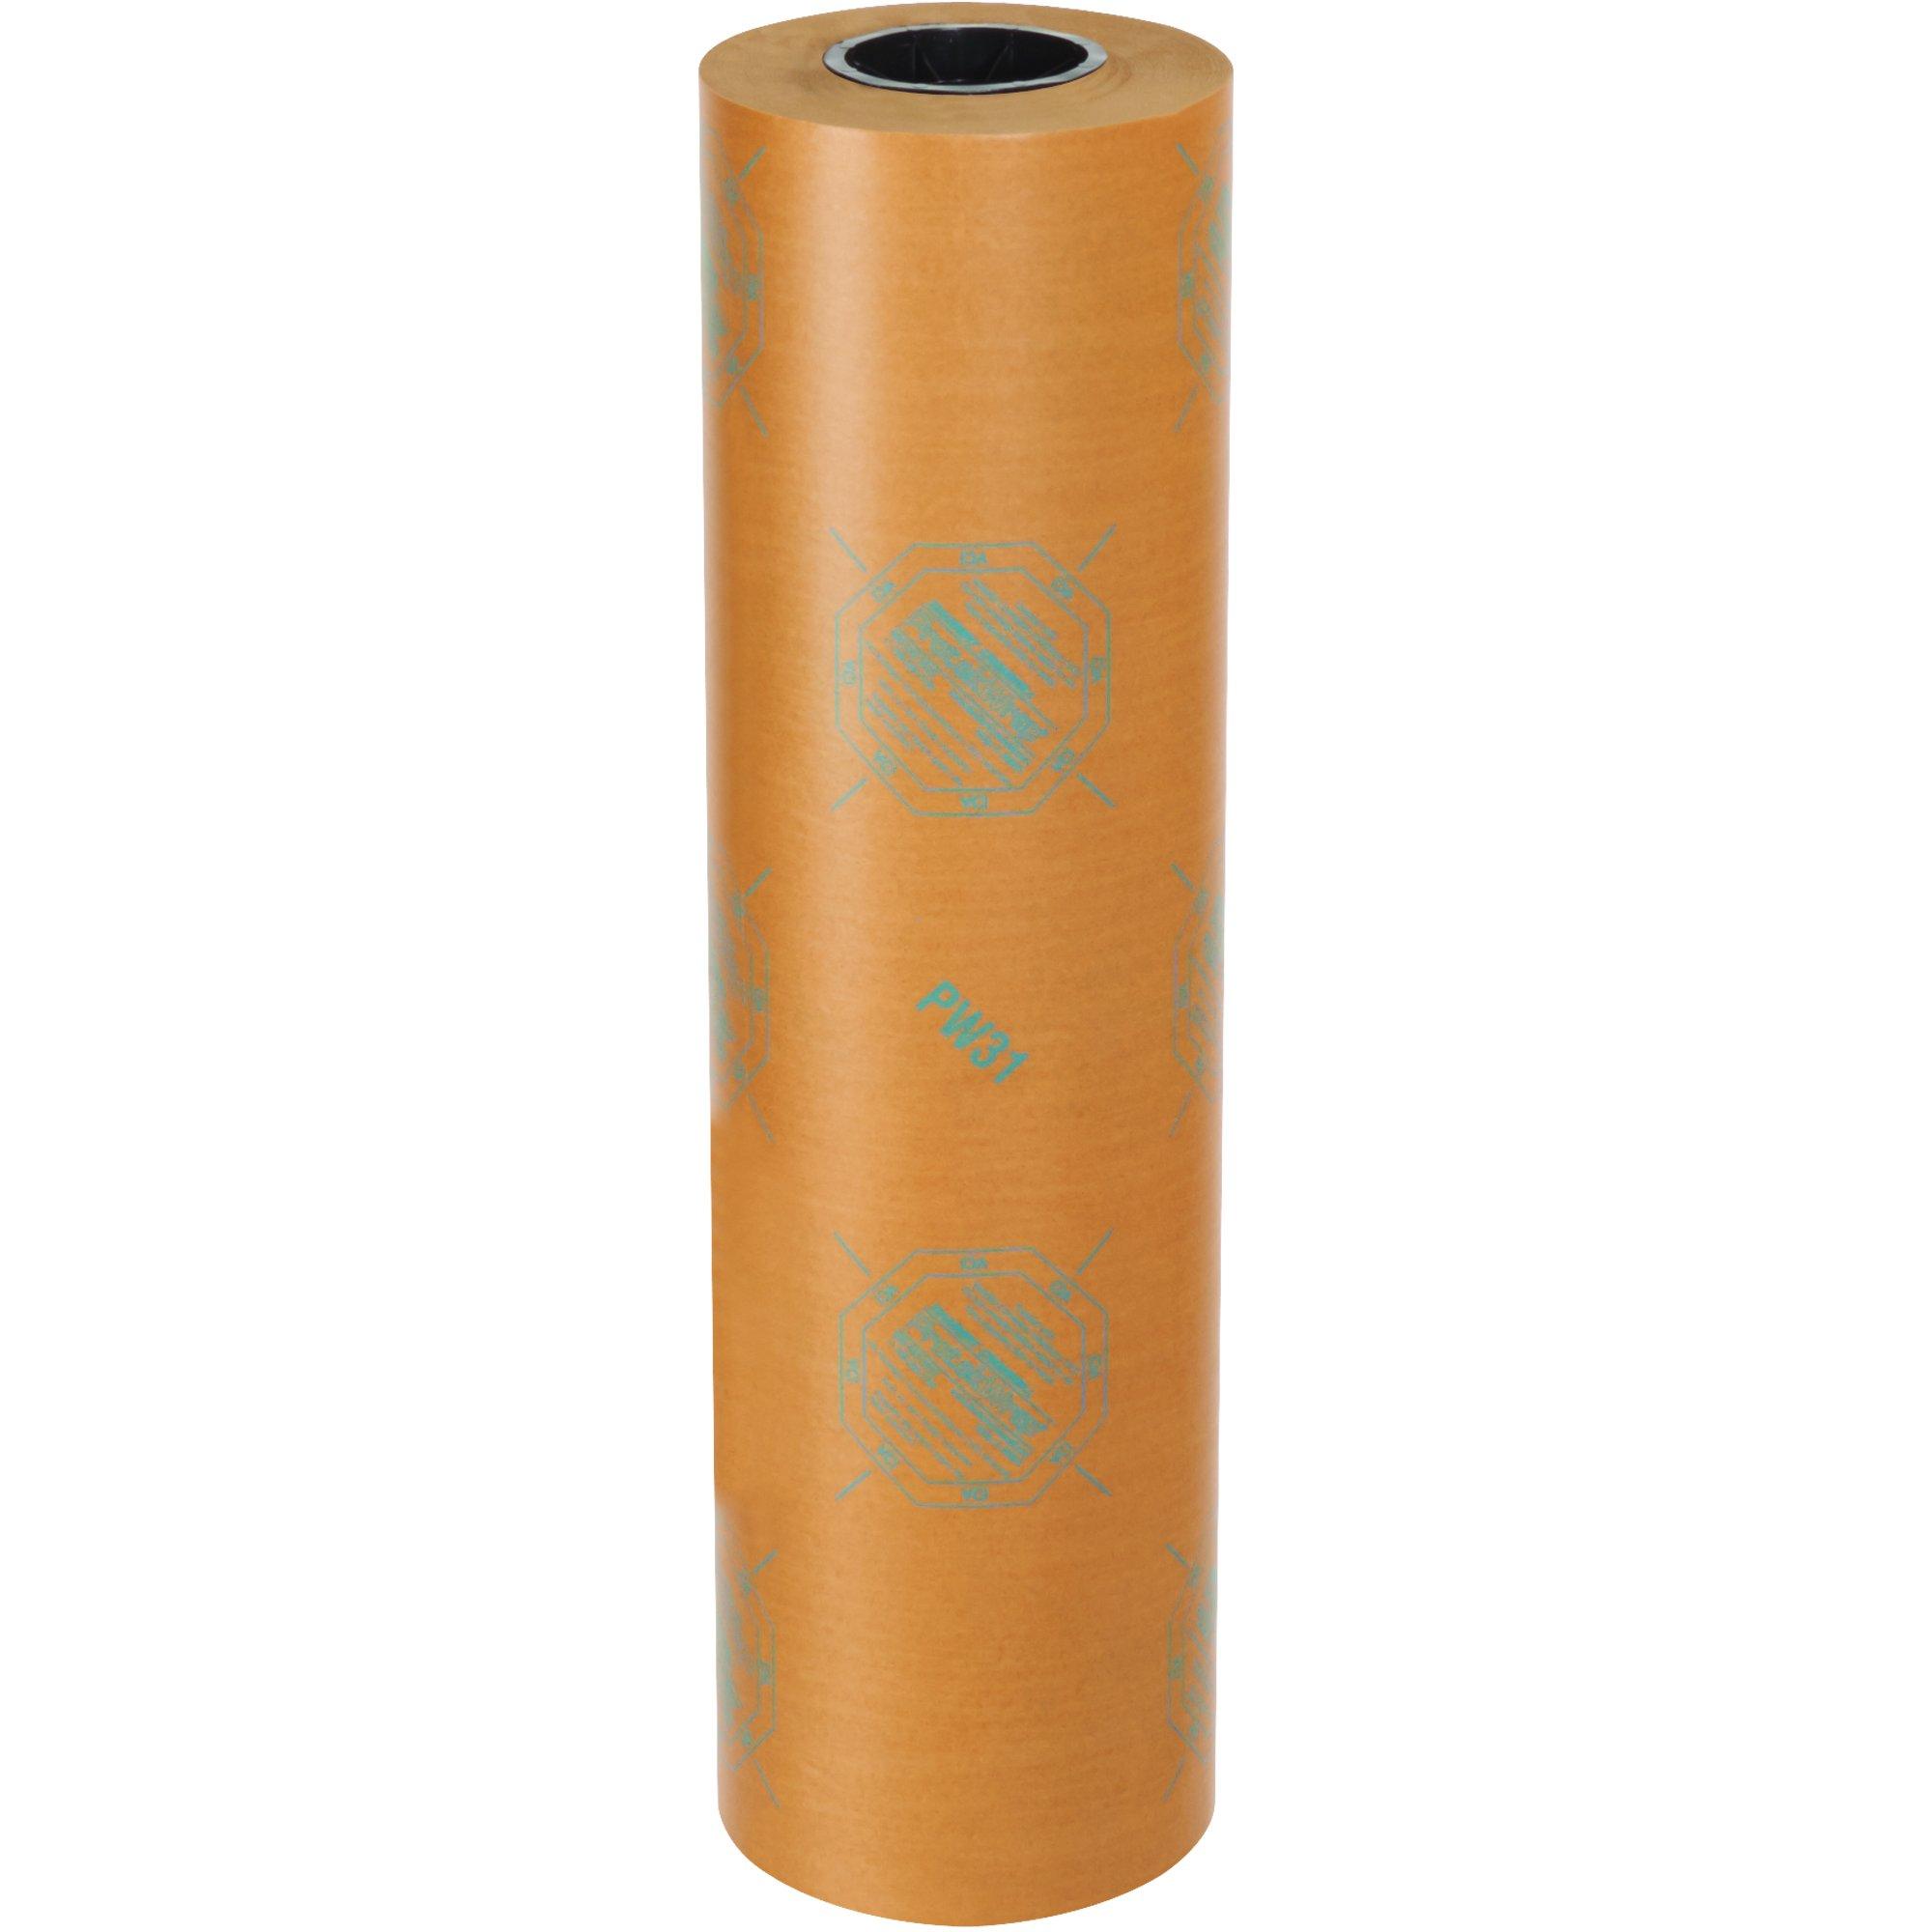 BOX USA BVCI24WAX 30# VCI Paper, Waxed Industrial Rolls, 24'' x 200 yd, Kraft by BOX USA